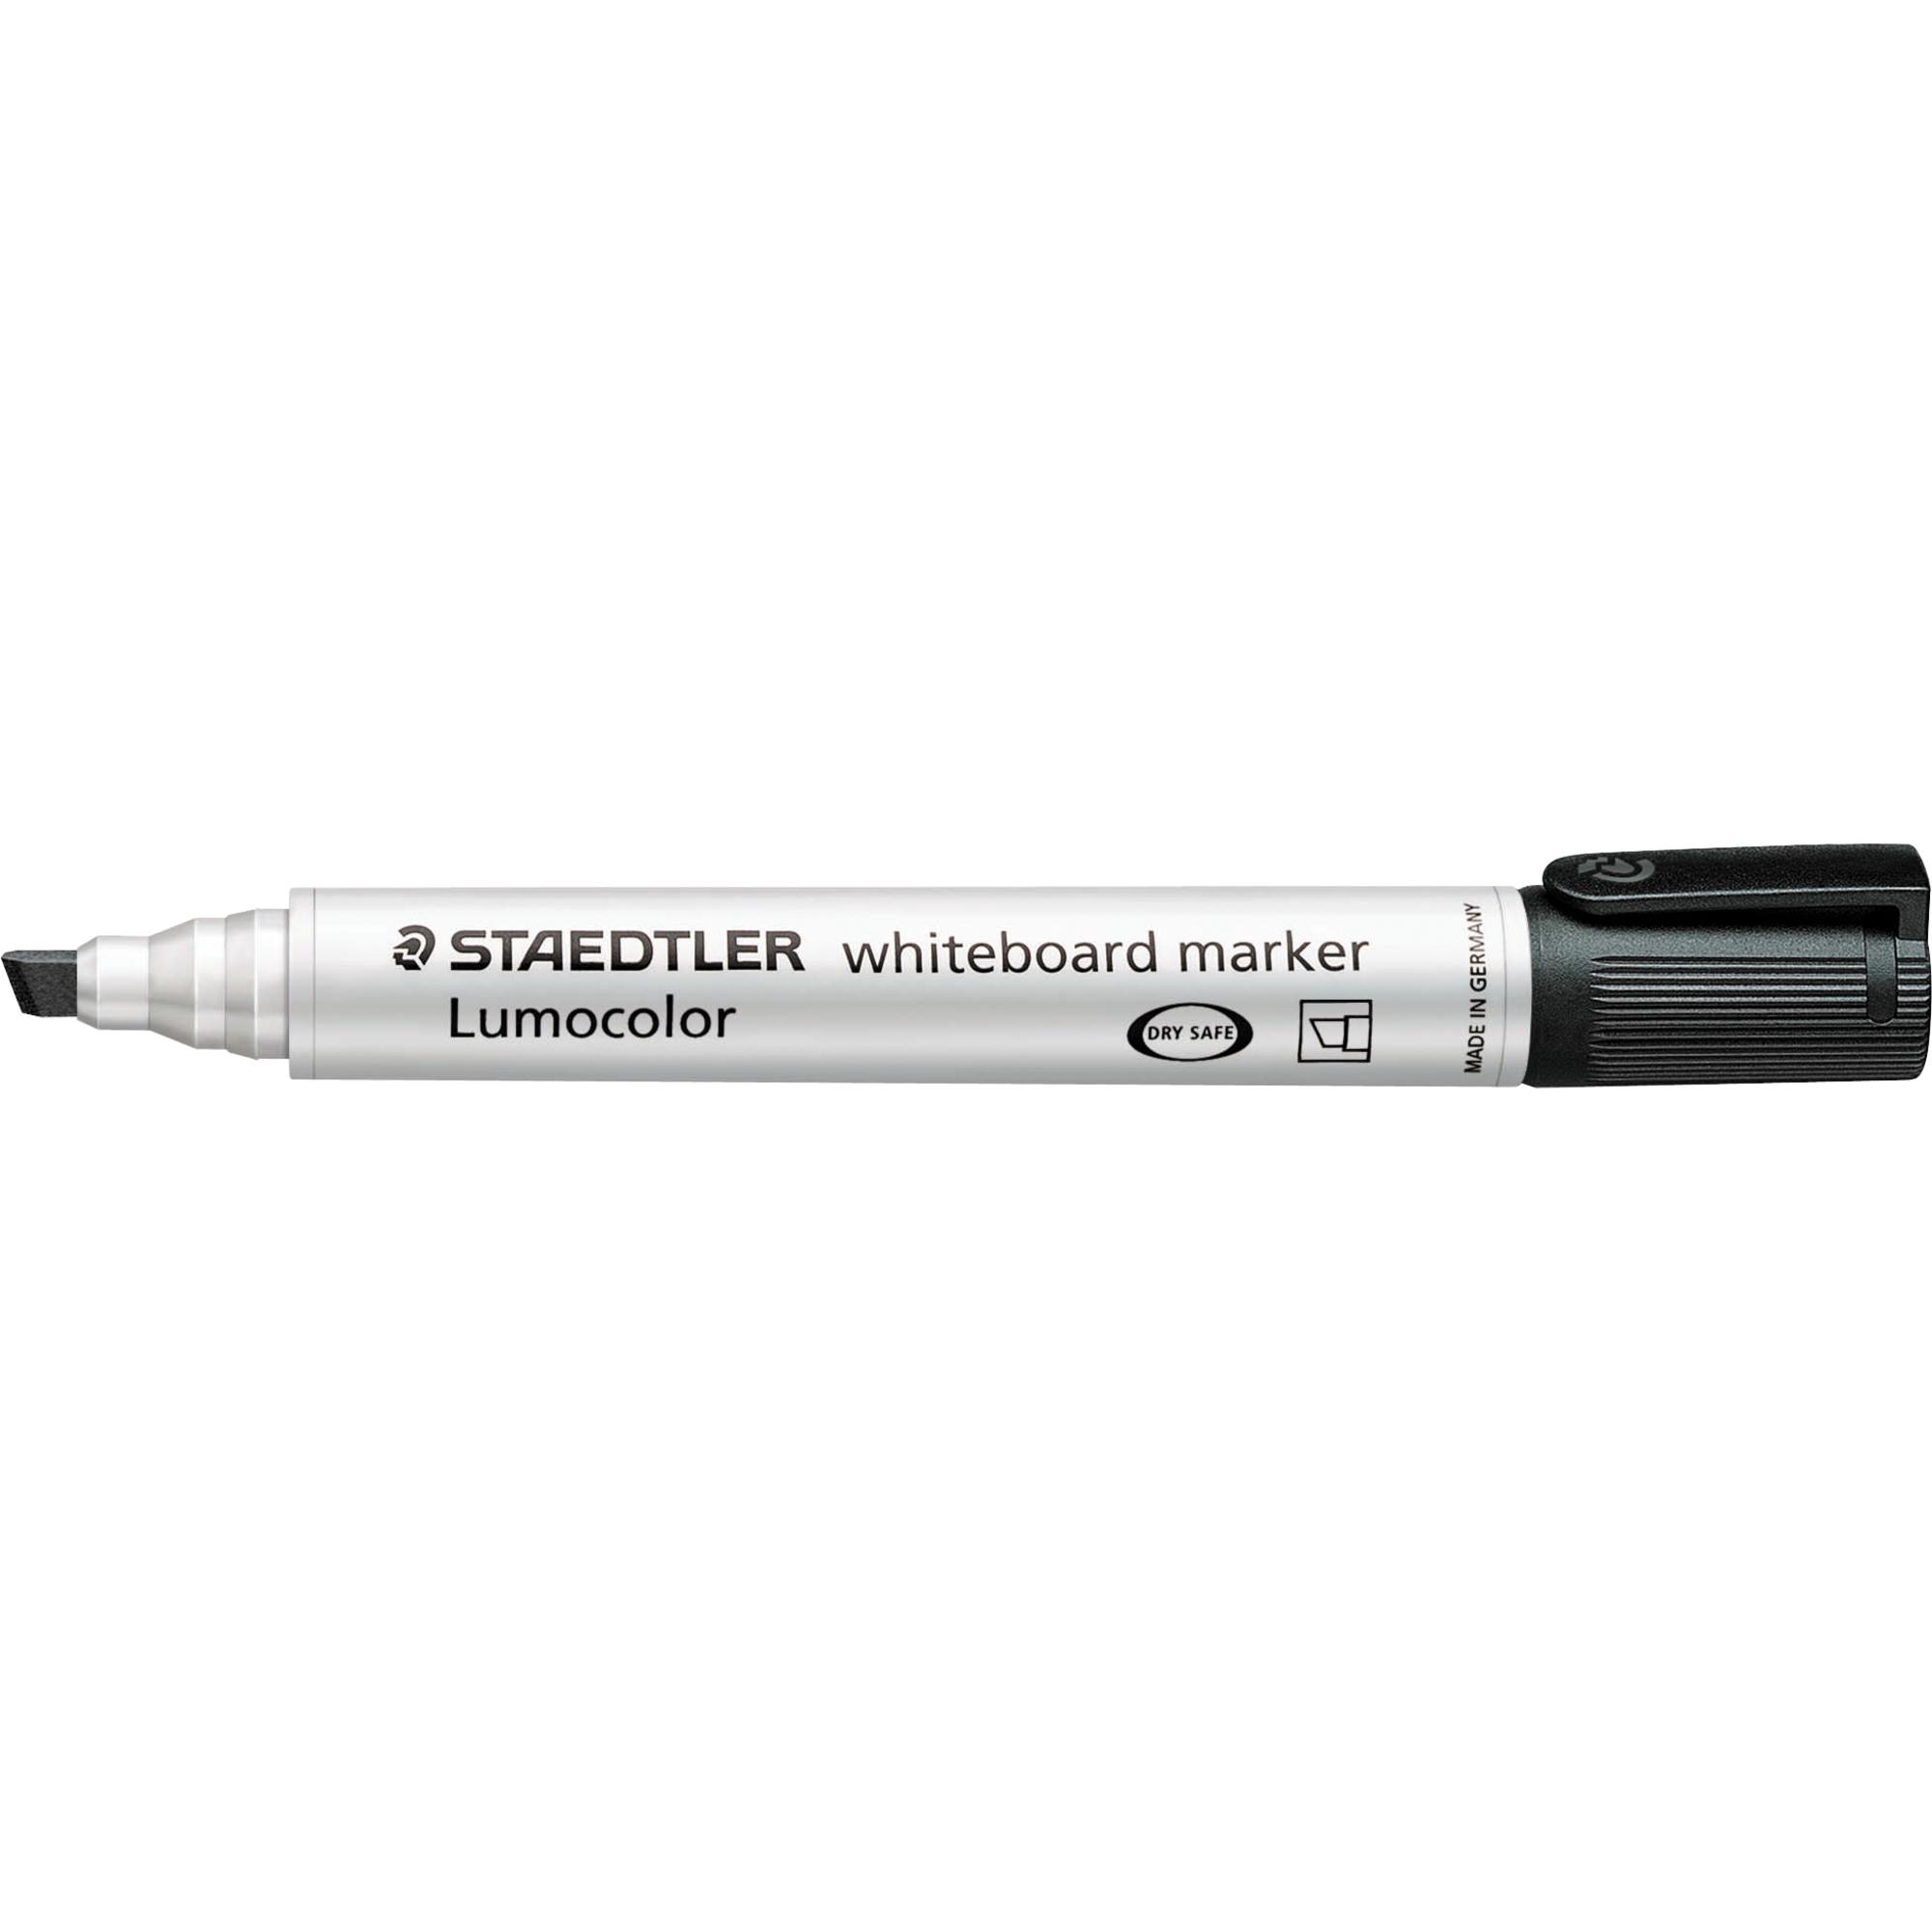 Staedtler Lumocolor Whiteboardmarker Marker Boardmarker 351 351B